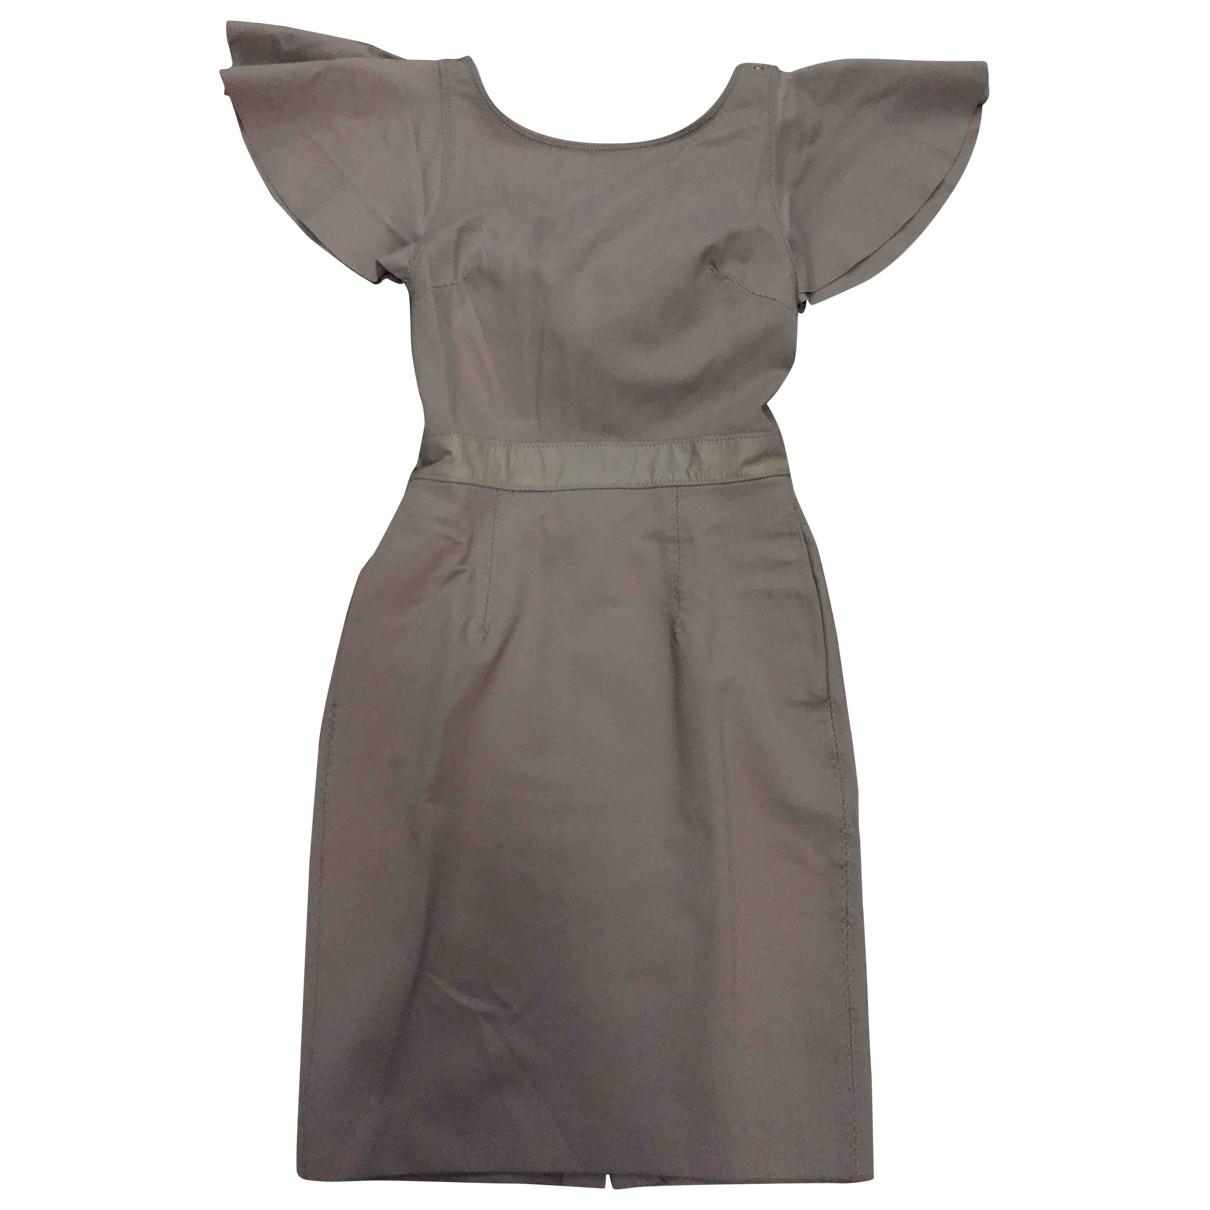 Diesel \N Pink dress for Women XS International